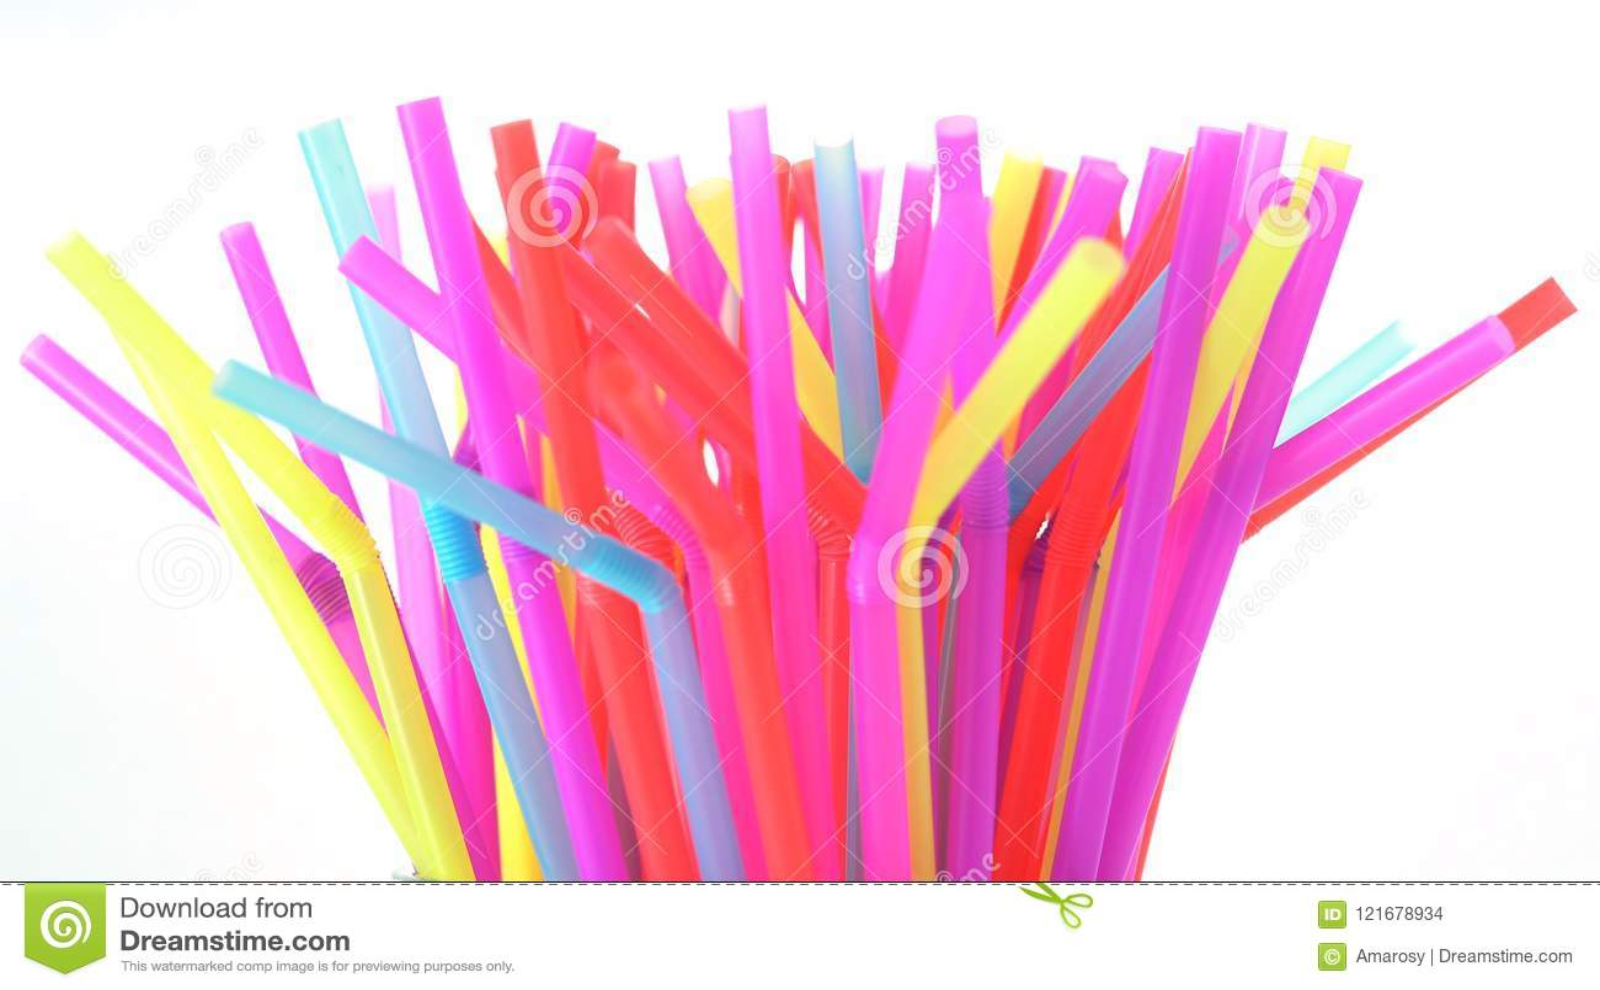 Banning plastic straws enviromental concerns concept.